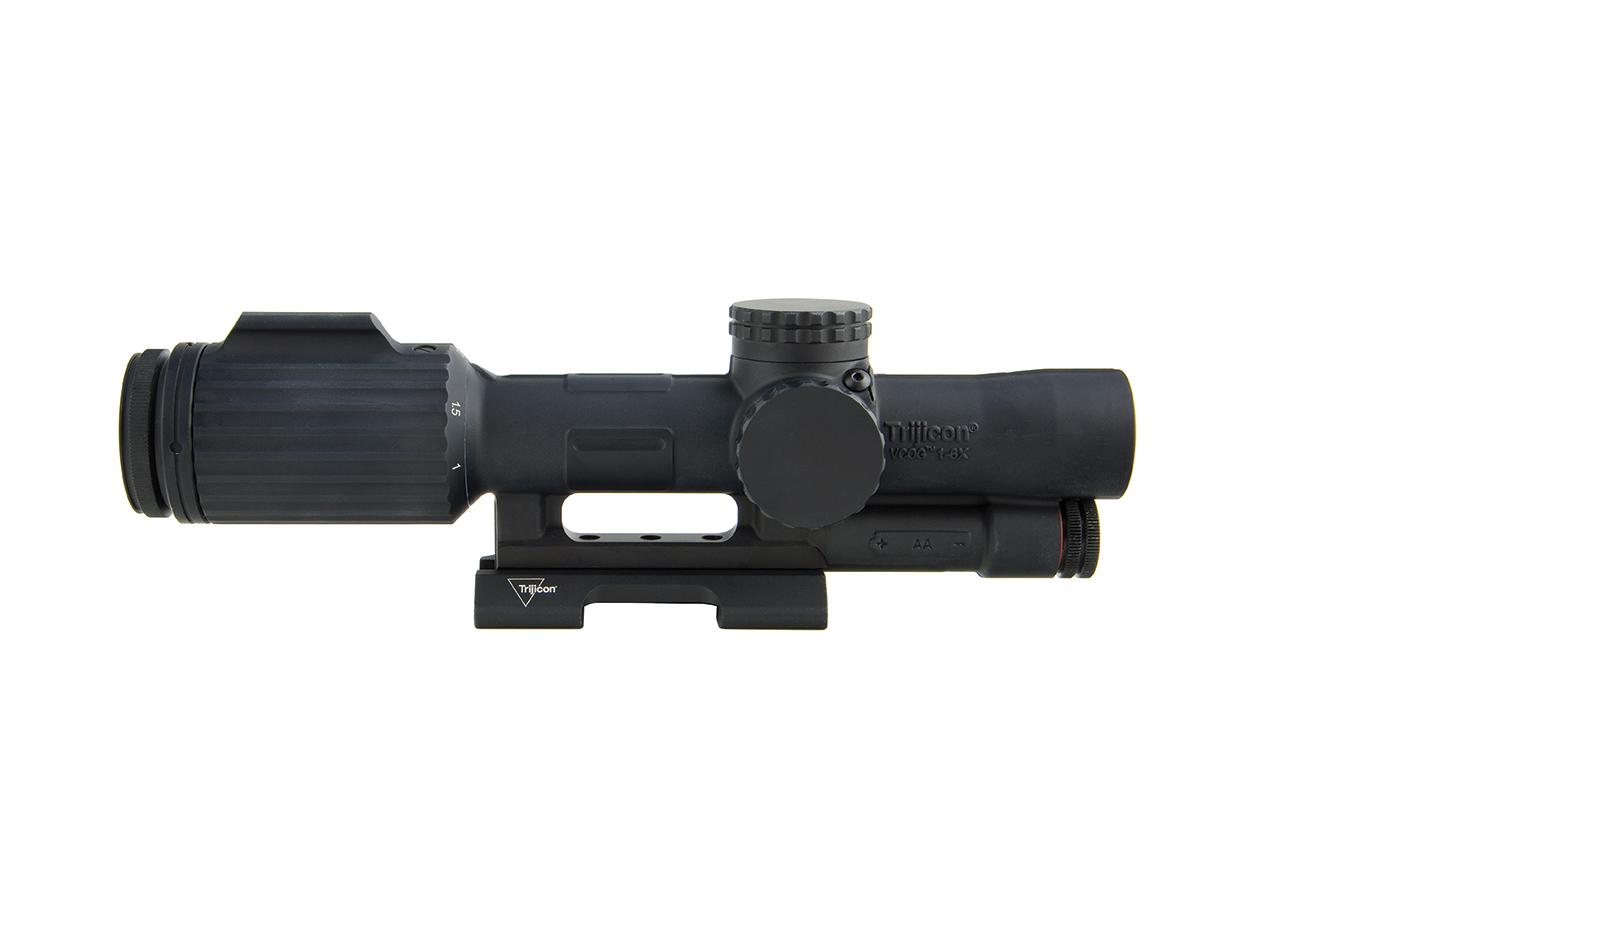 VC16-C-1600053 angle 6